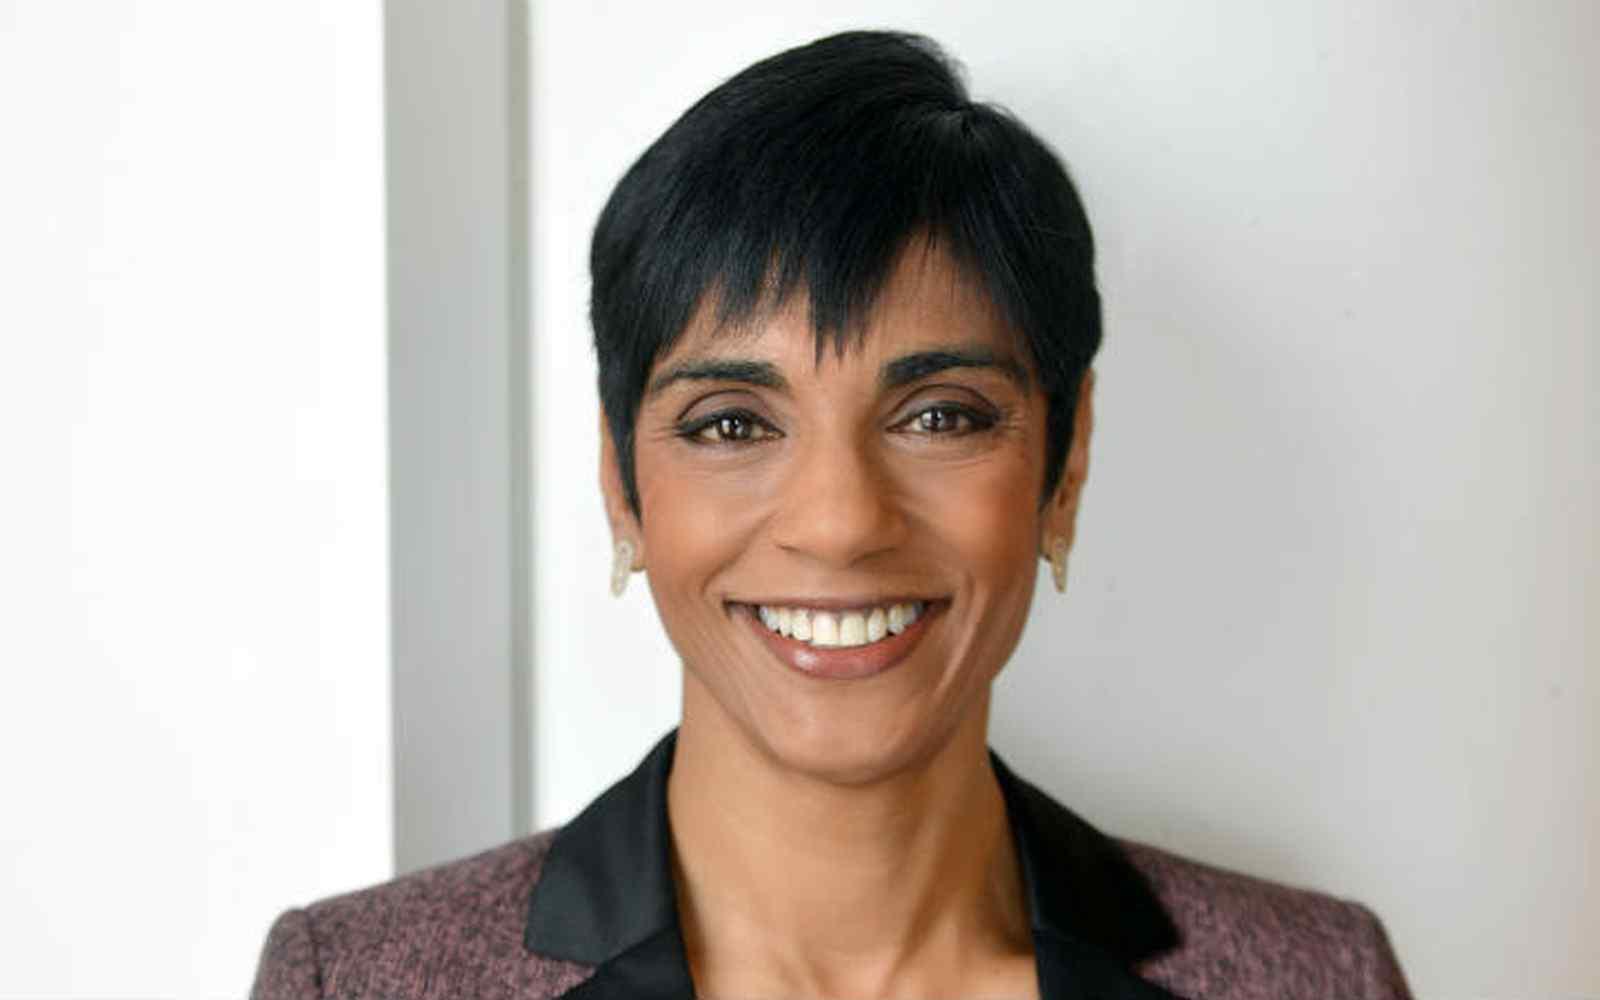 A headshot of Reeta Chakrabarti